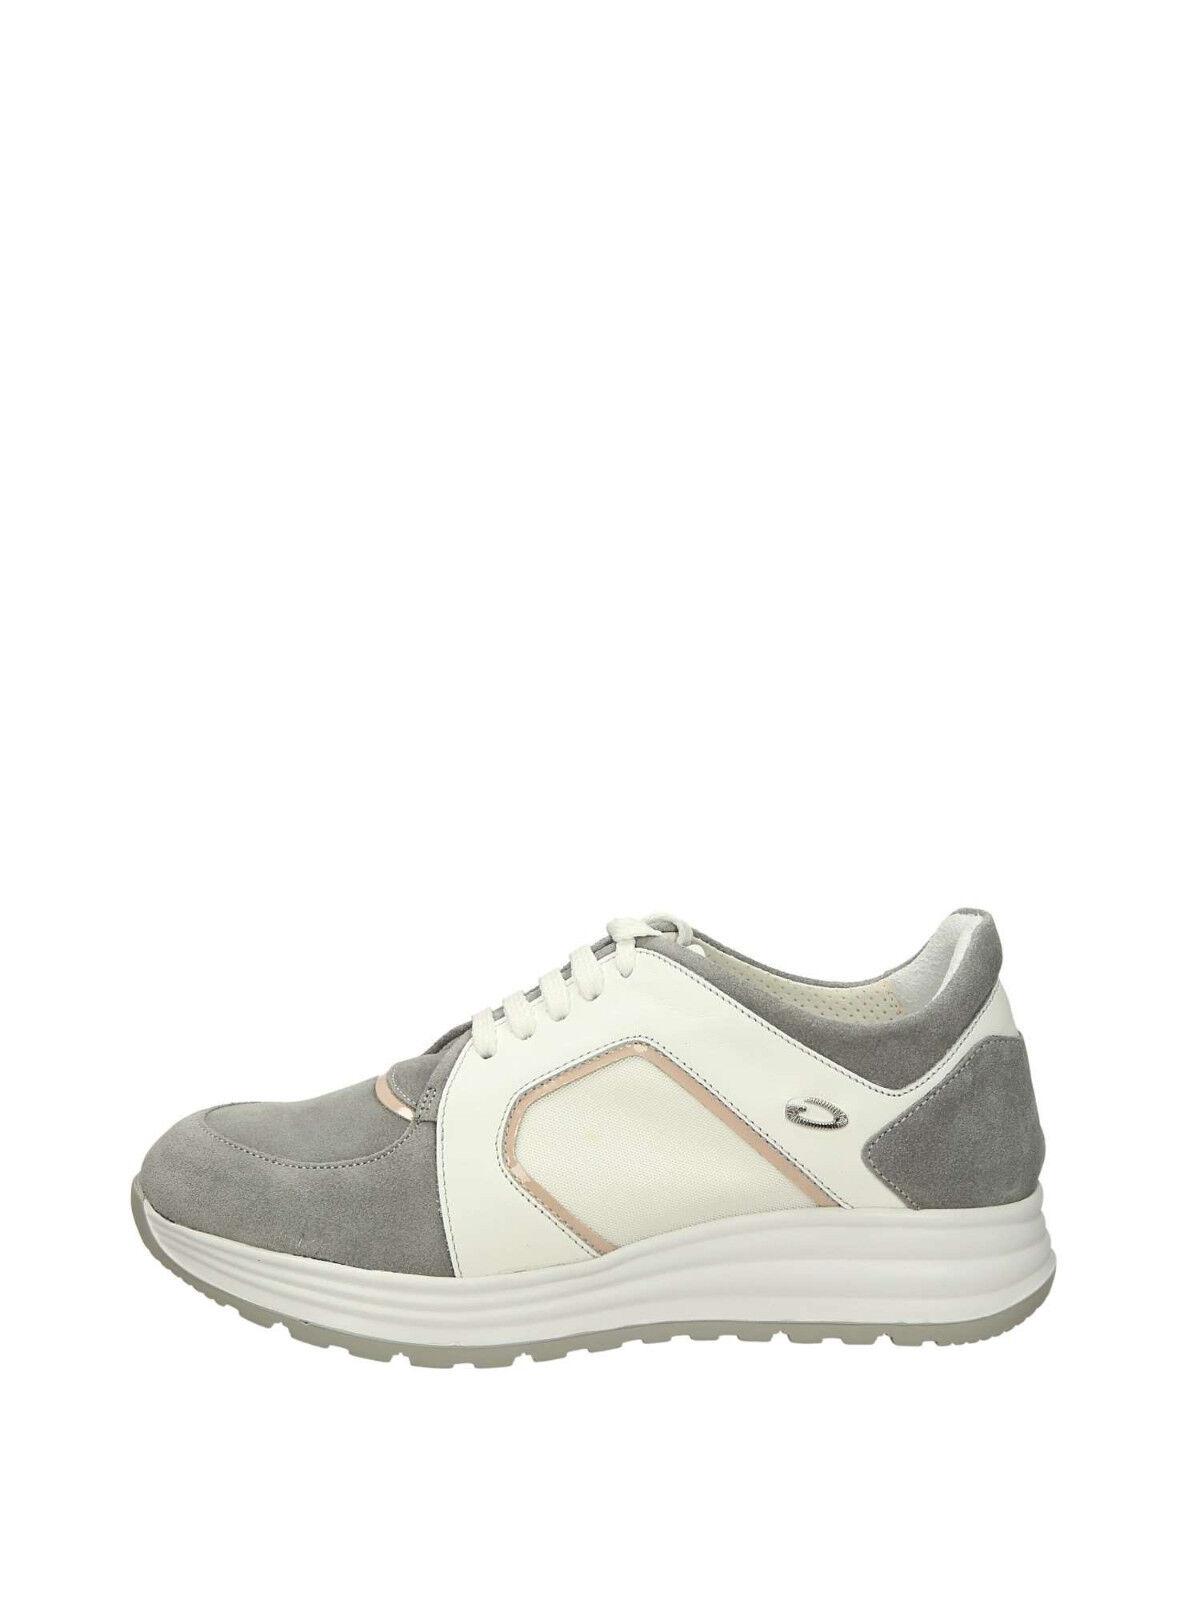 shoes GUARDIANI SD60431H   SX82 women PELLE SNEAKER grey GREY ORIGINALI NEW